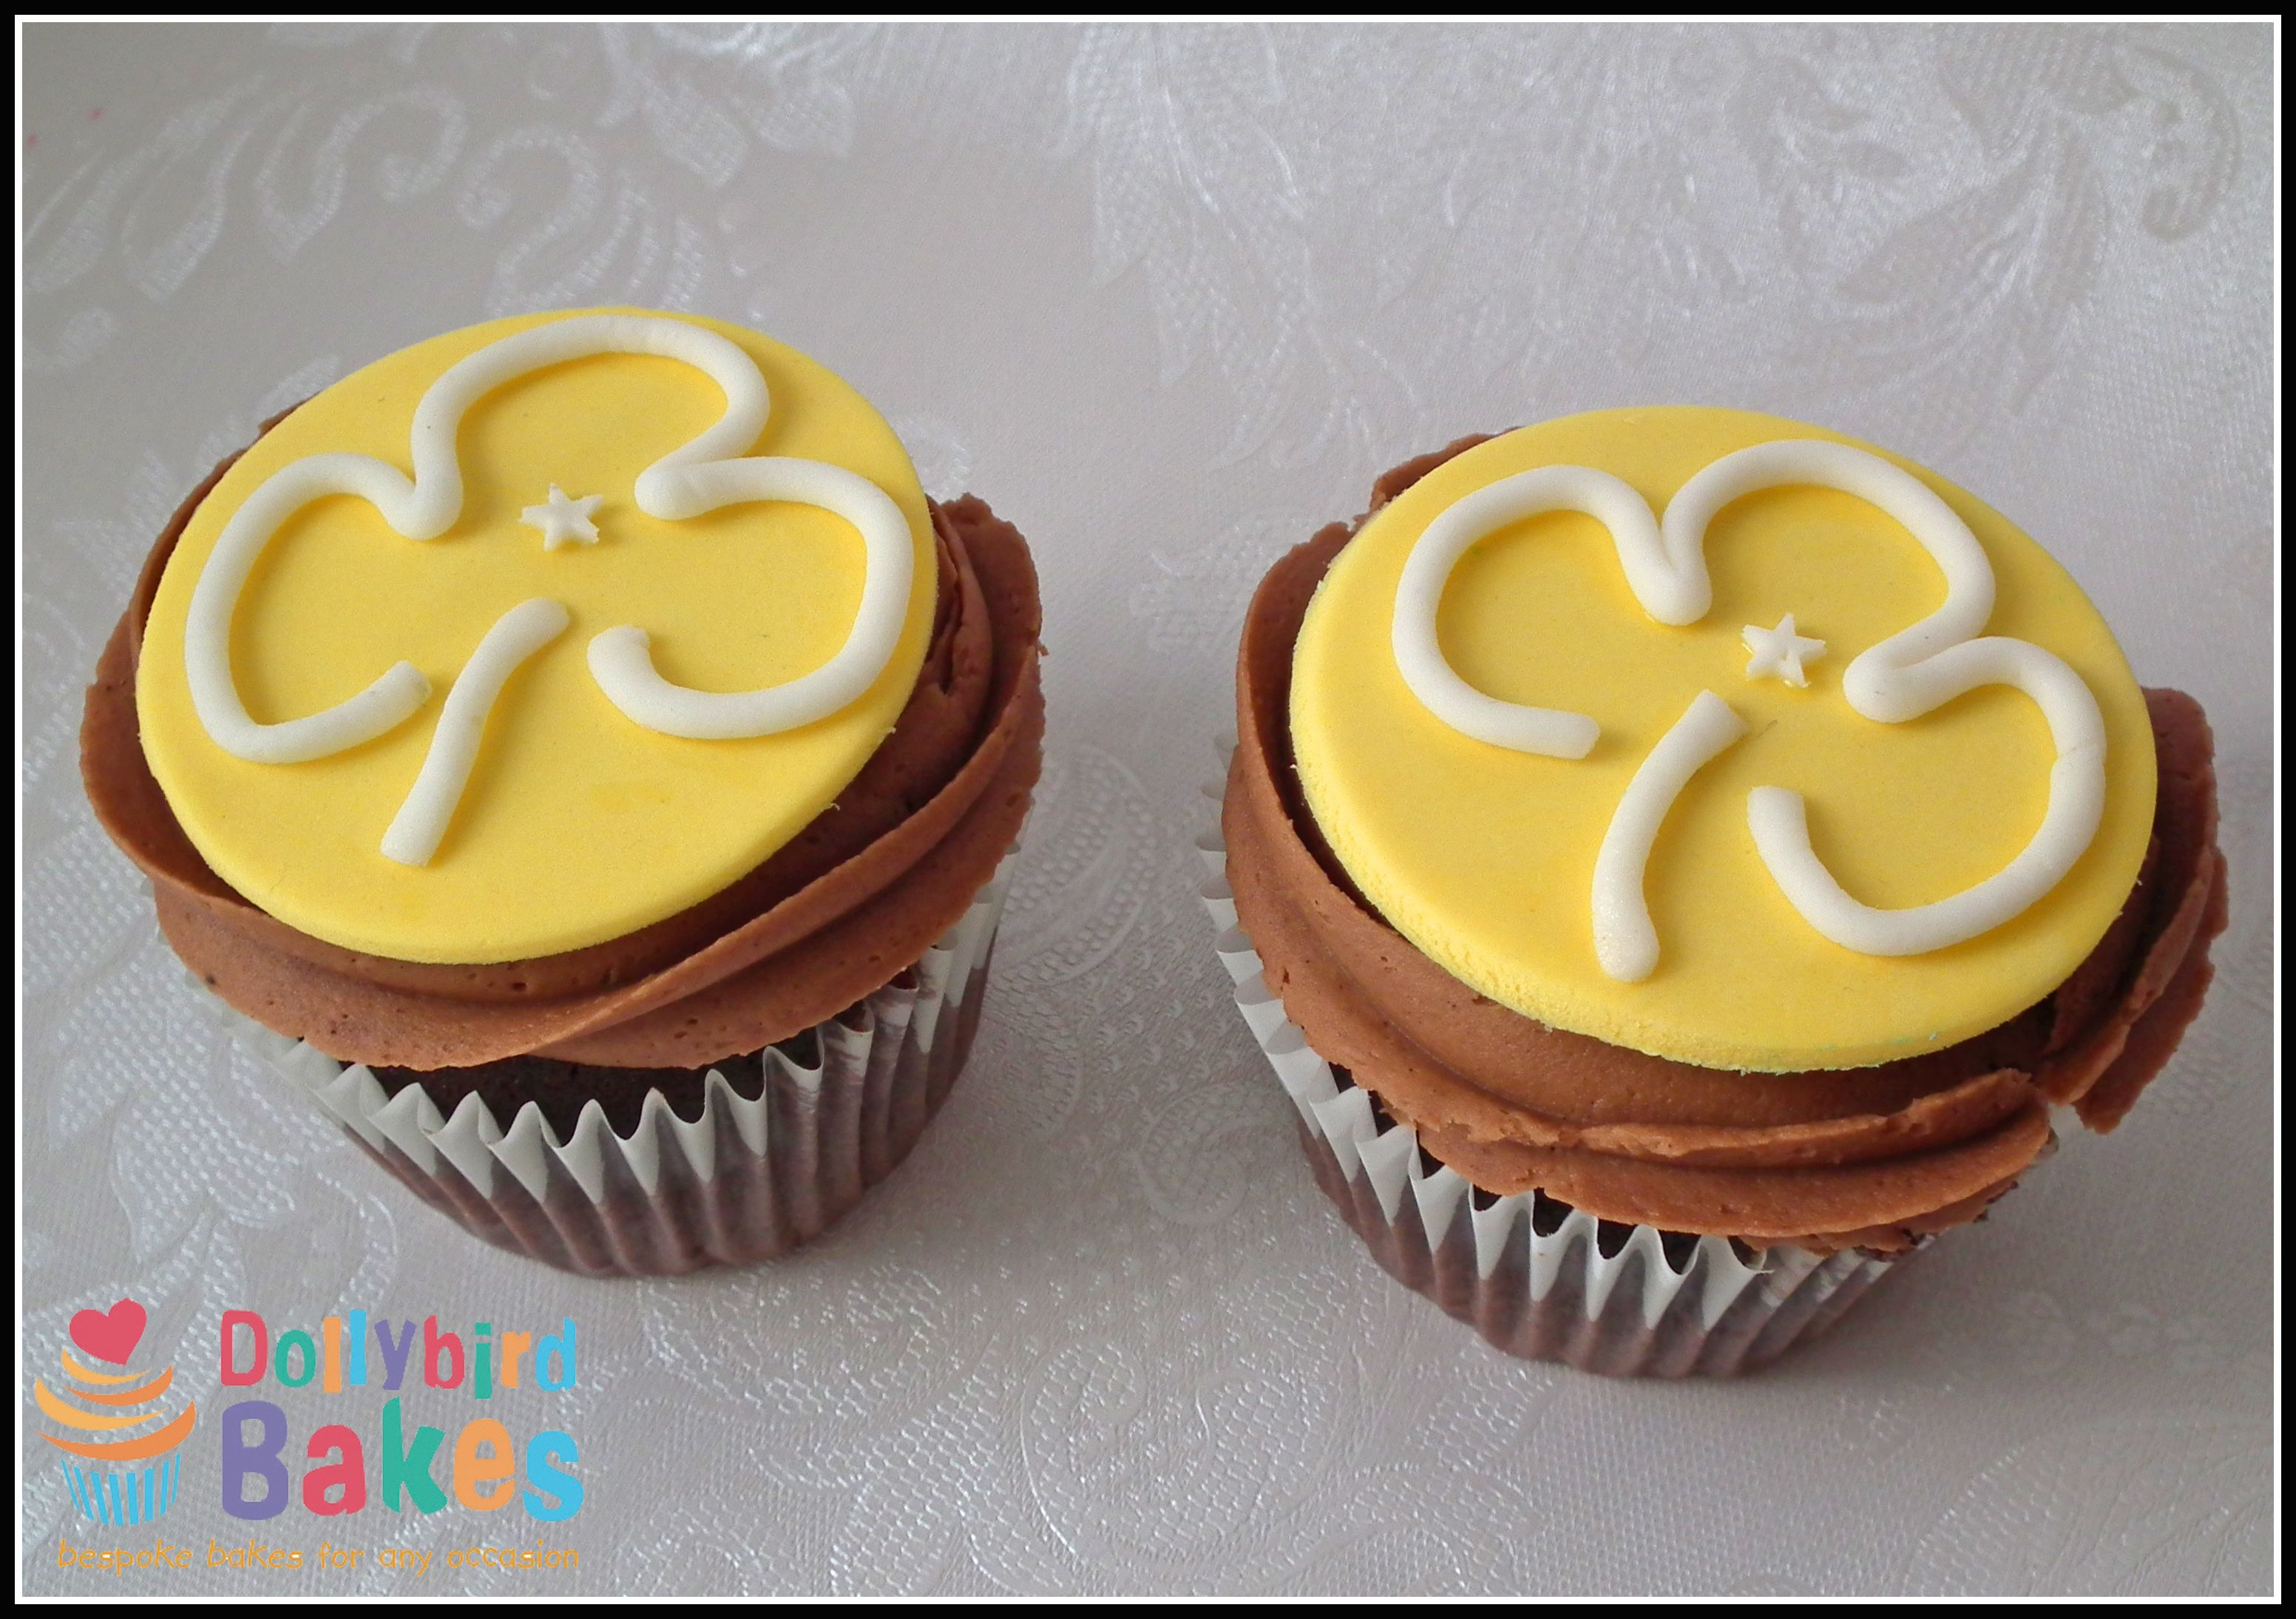 Girl Guides cupcakes - dollybird bakes More Brownies ...